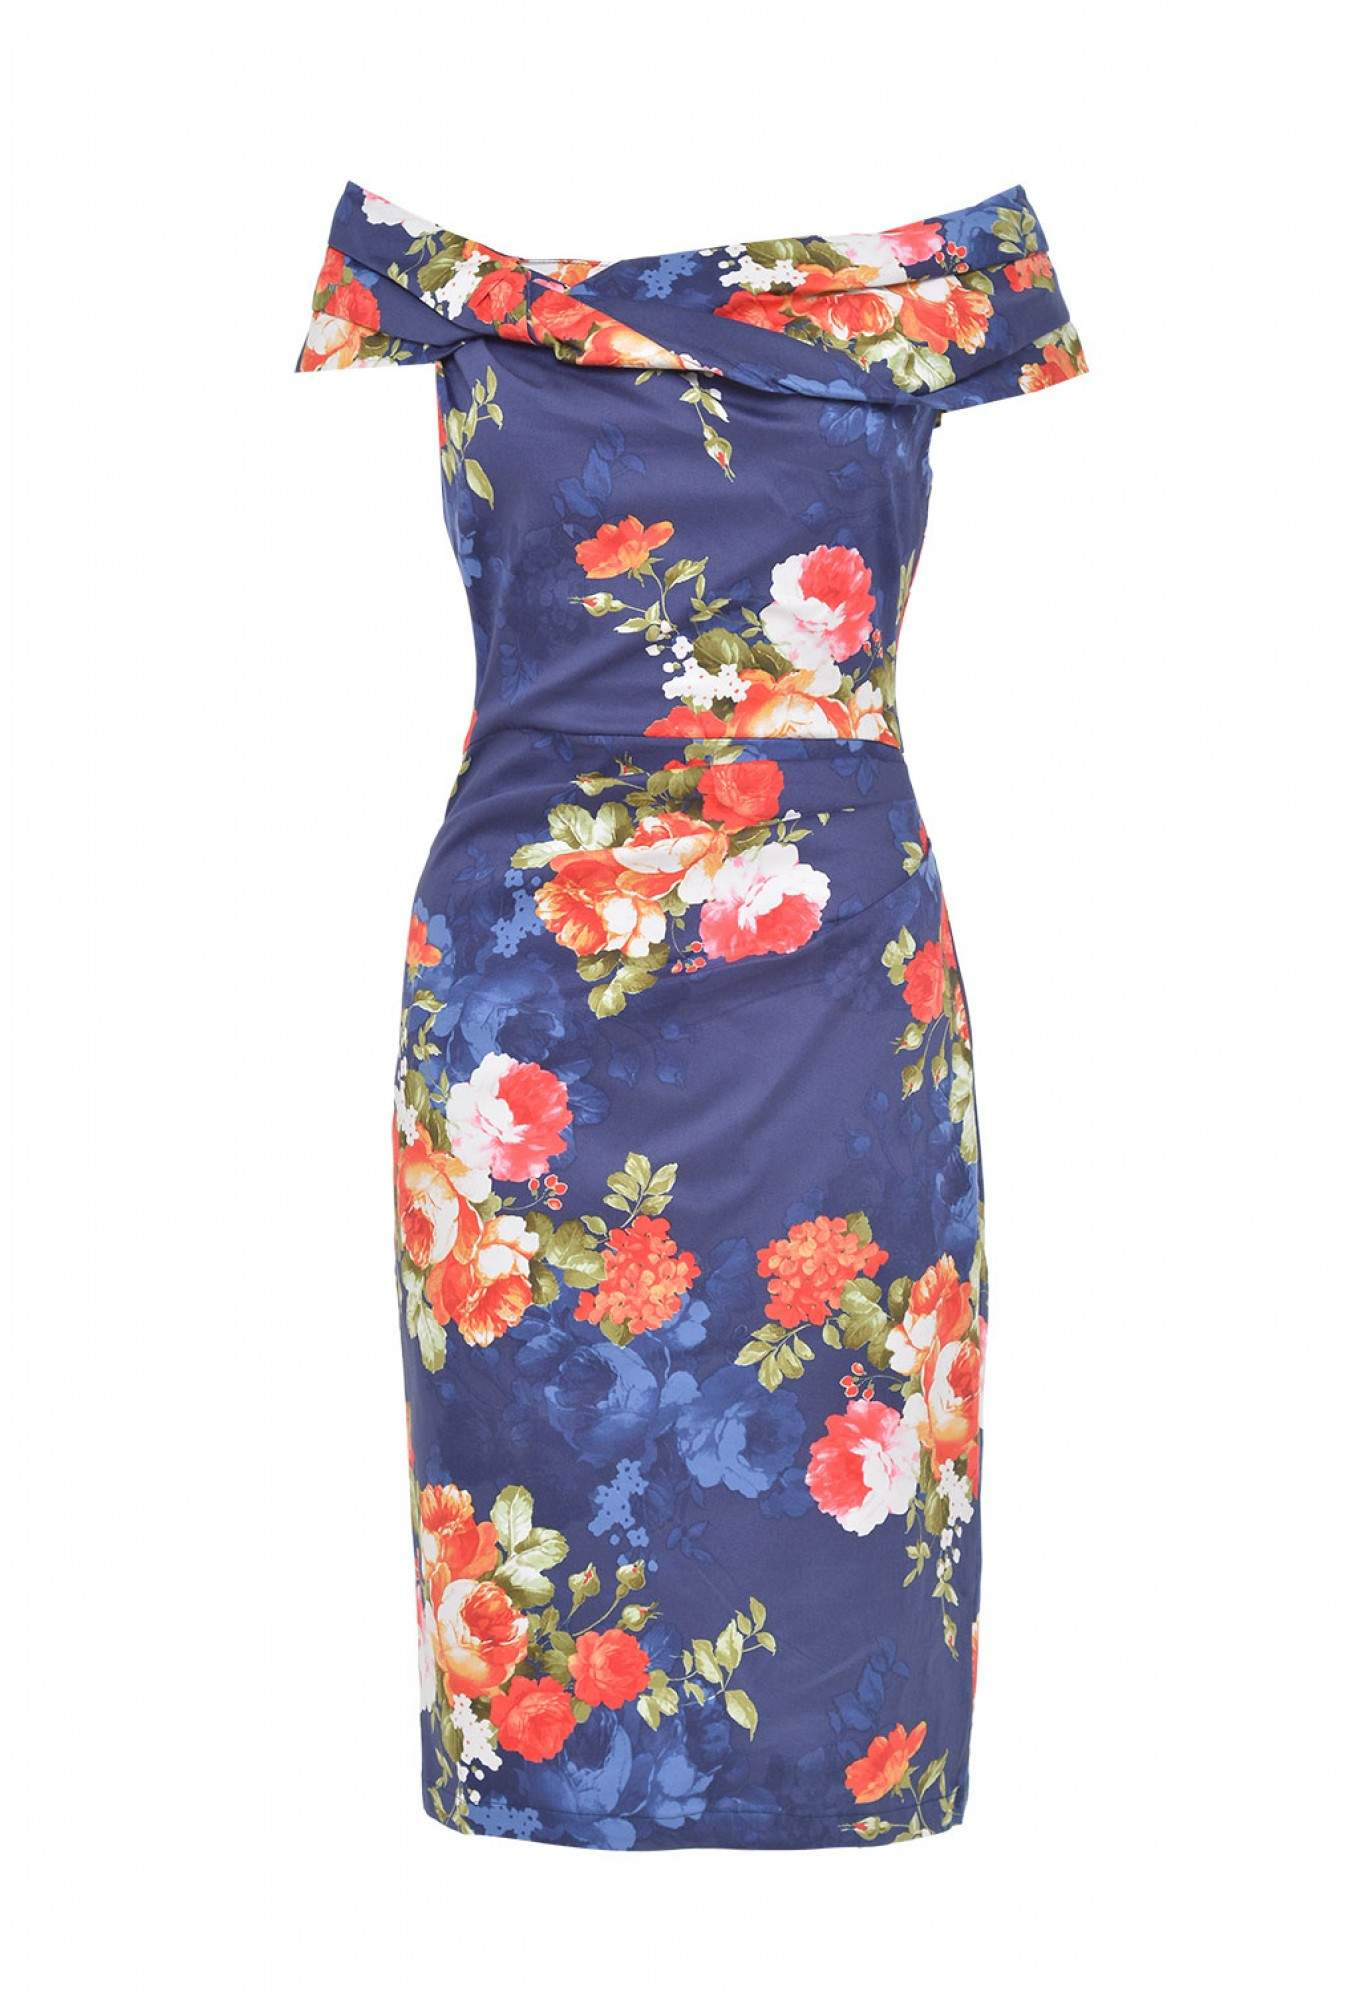 a6685bc5a5aa Jolie Moi Alva Floral Off Shoulder Dress in Navy